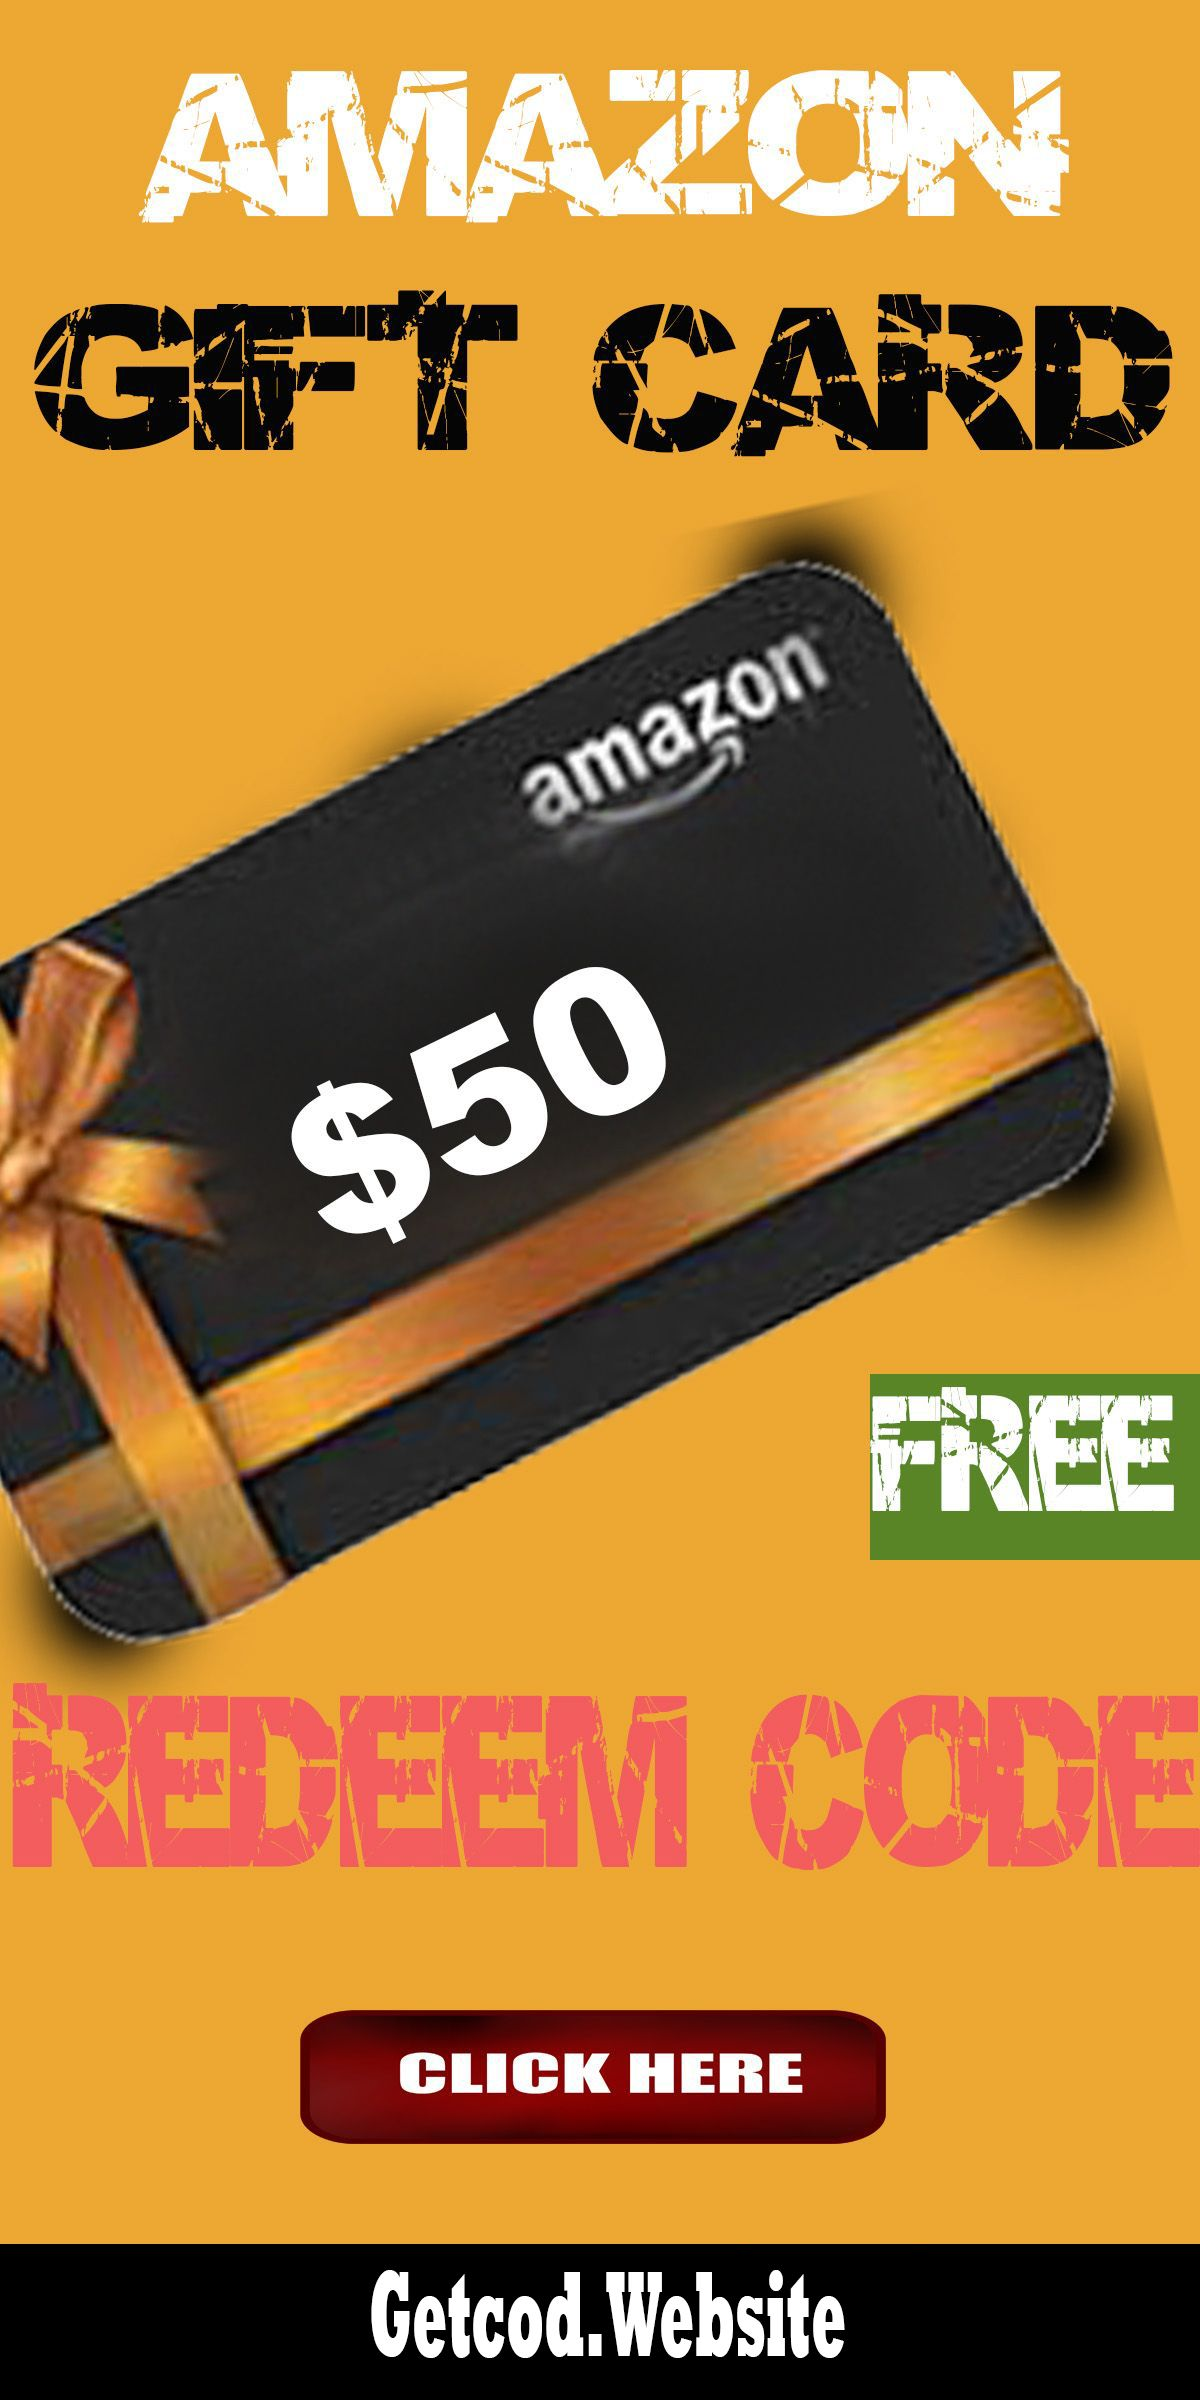 Amazon Promo Code Prime Now Promo Code Amazon Gift Card Free Amazon Gift Cards Free Amazon Products